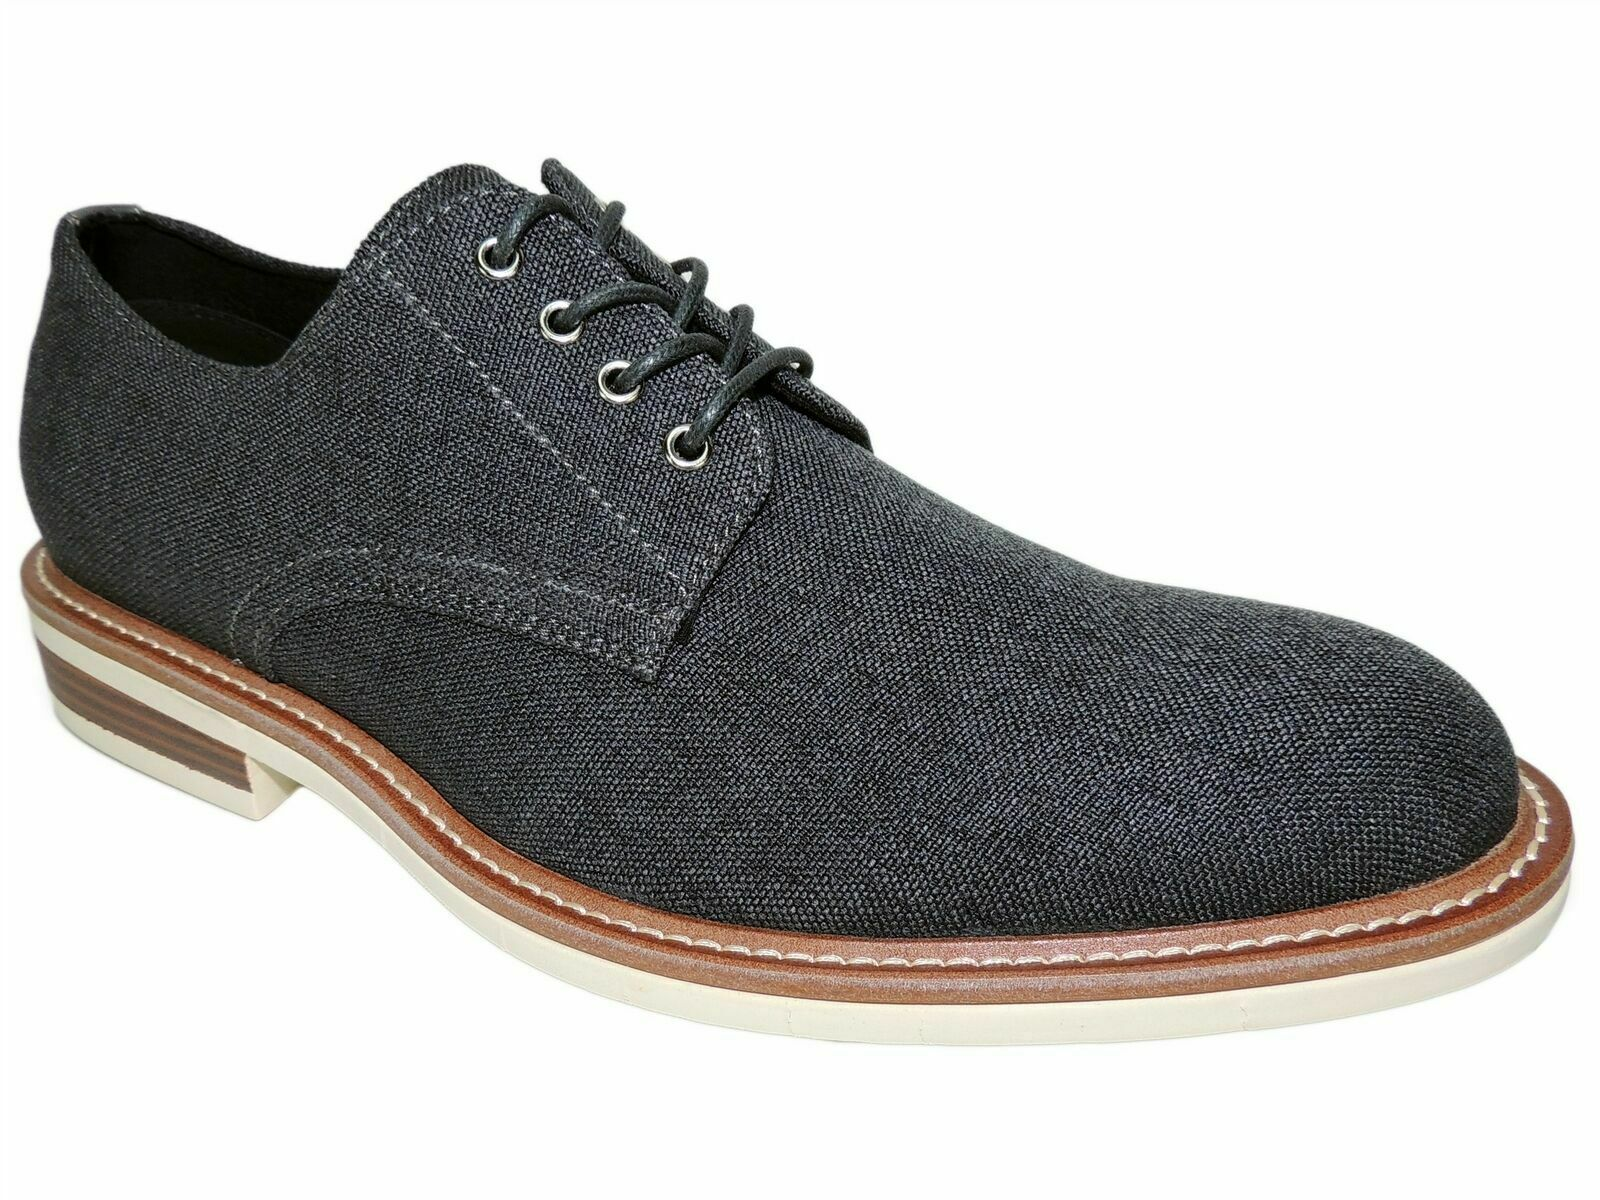 Men's Kenneth Cole Reaction Klay Flex Oxford Dress Shoes Steel Size US 7.5M B4HP